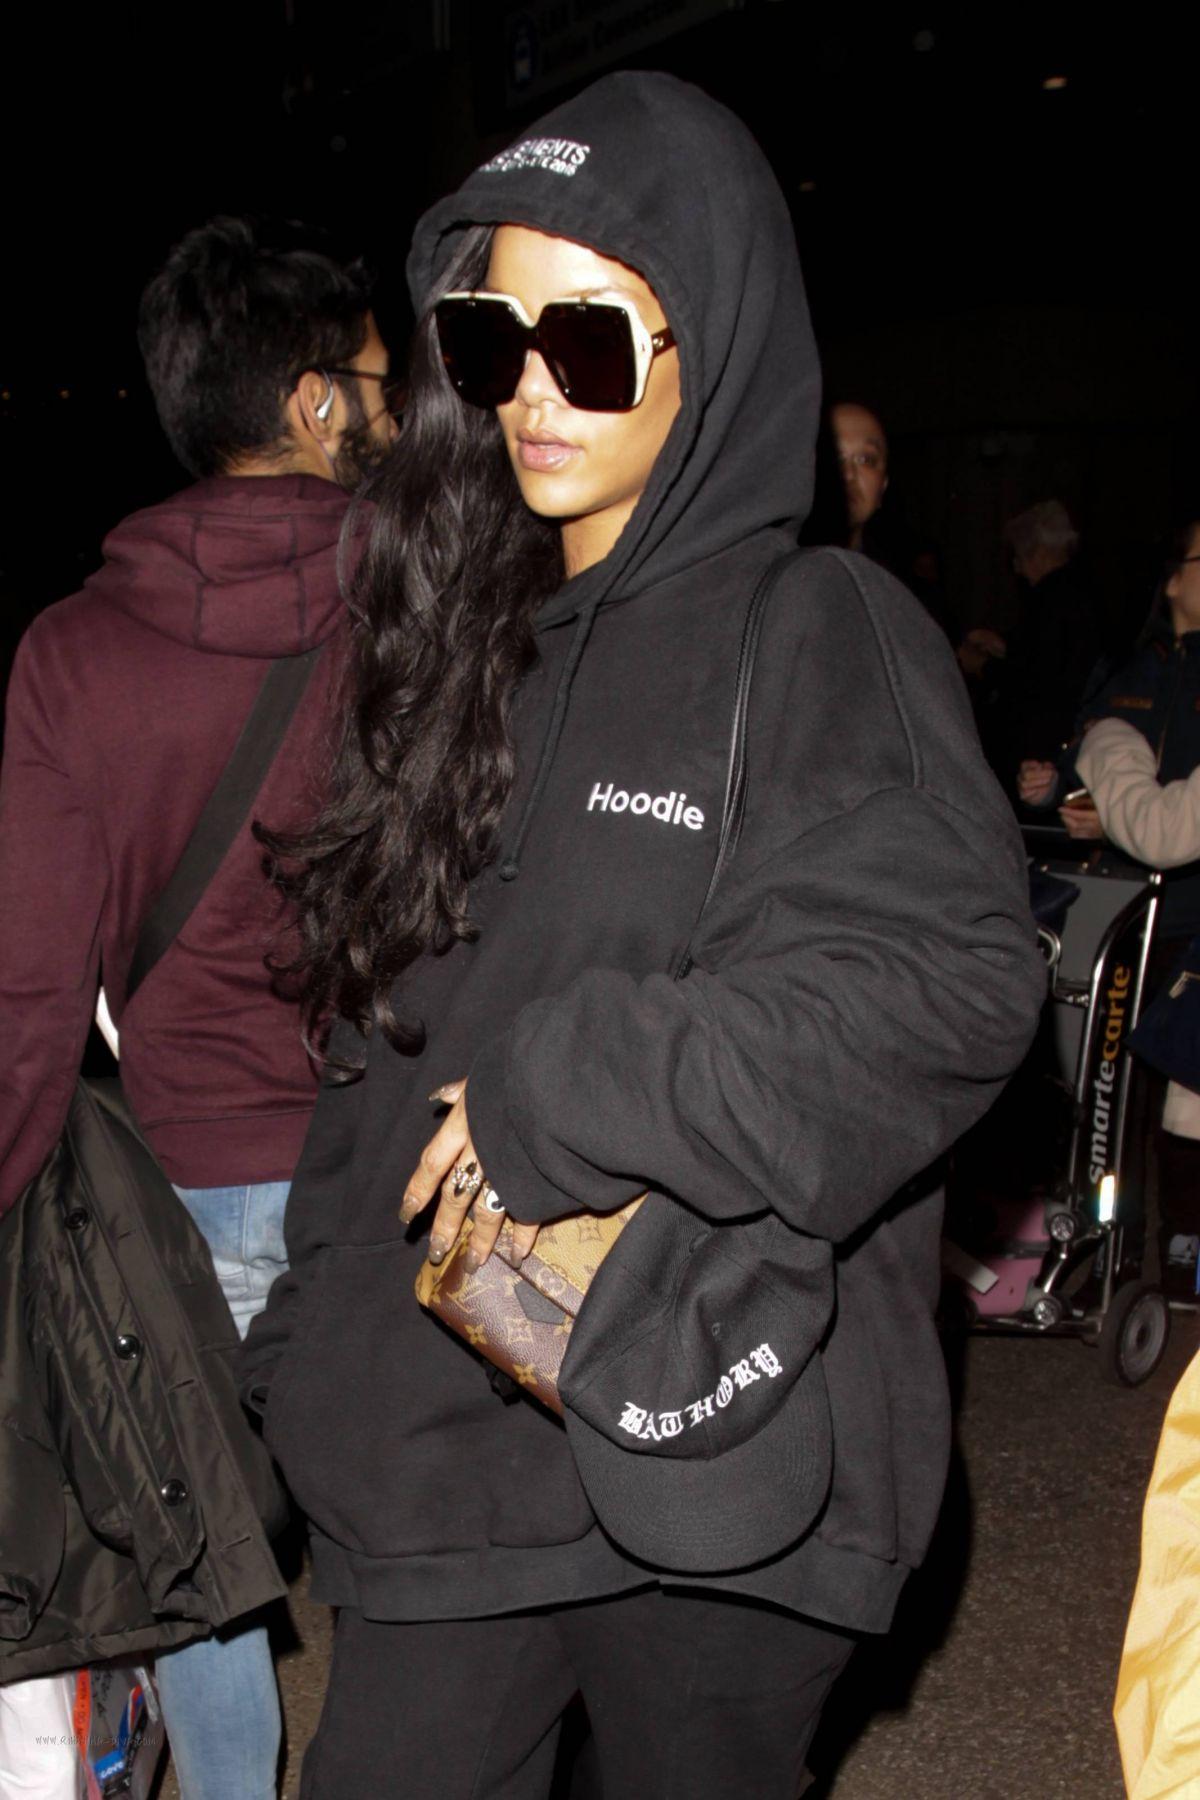 RIHANNA at LAX Airport in Los Angeles 12/16/2016